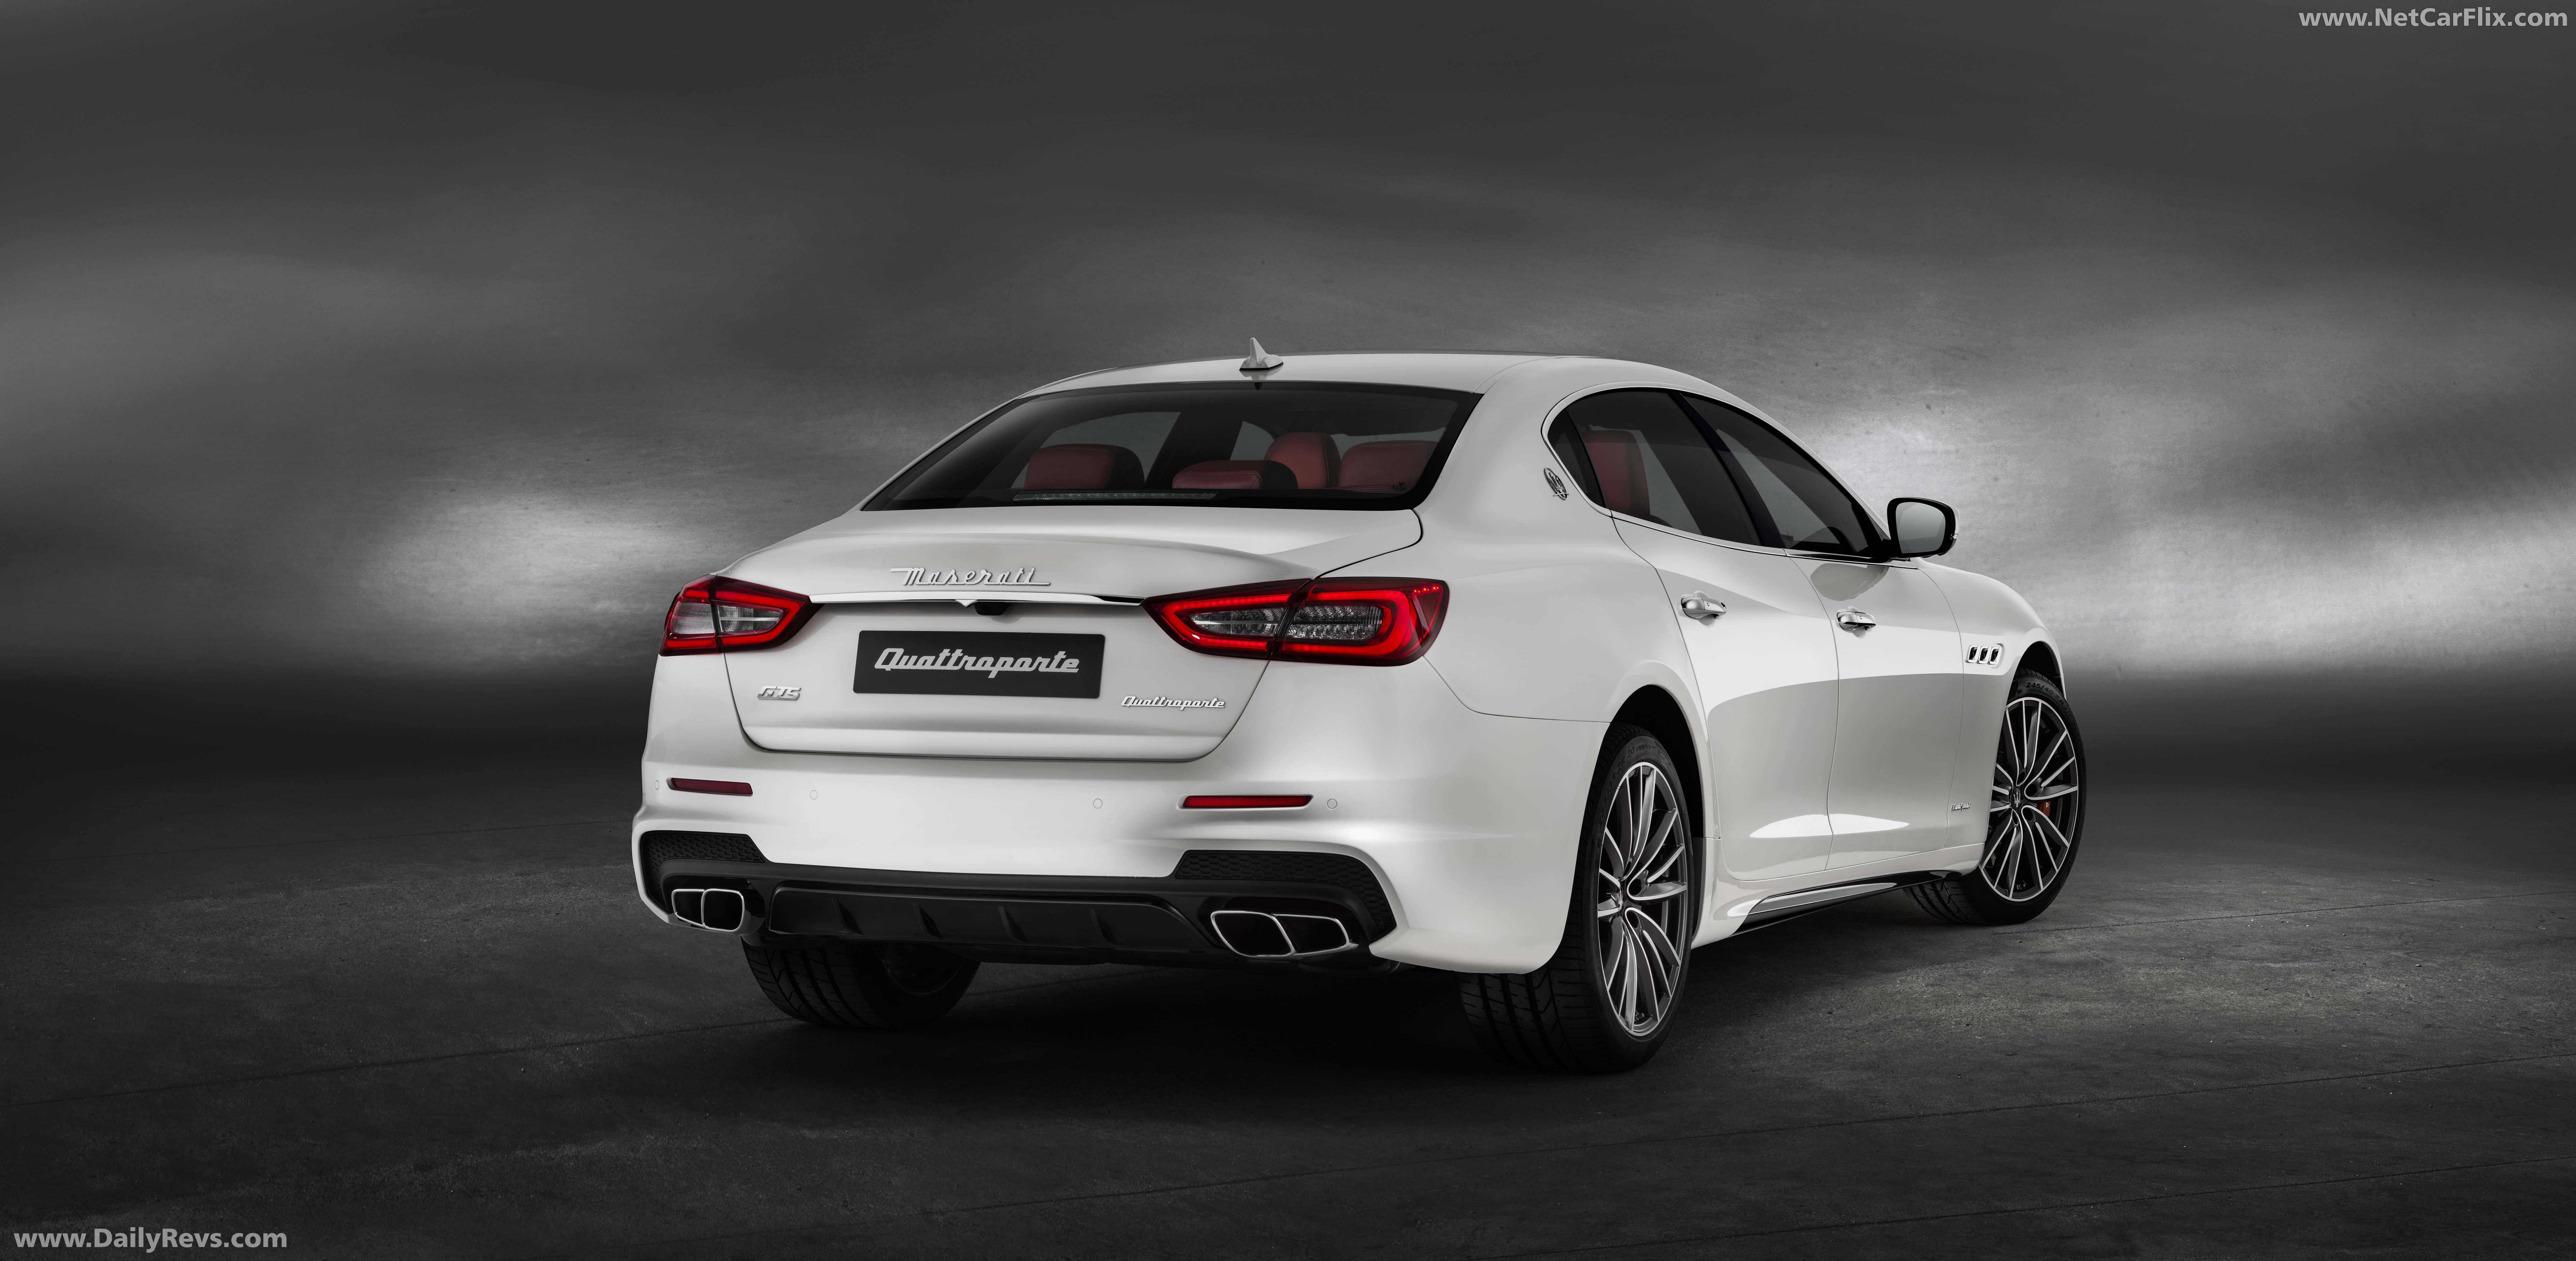 2019 Maserati Quattroporte - HD Pictures,Specs,information ...